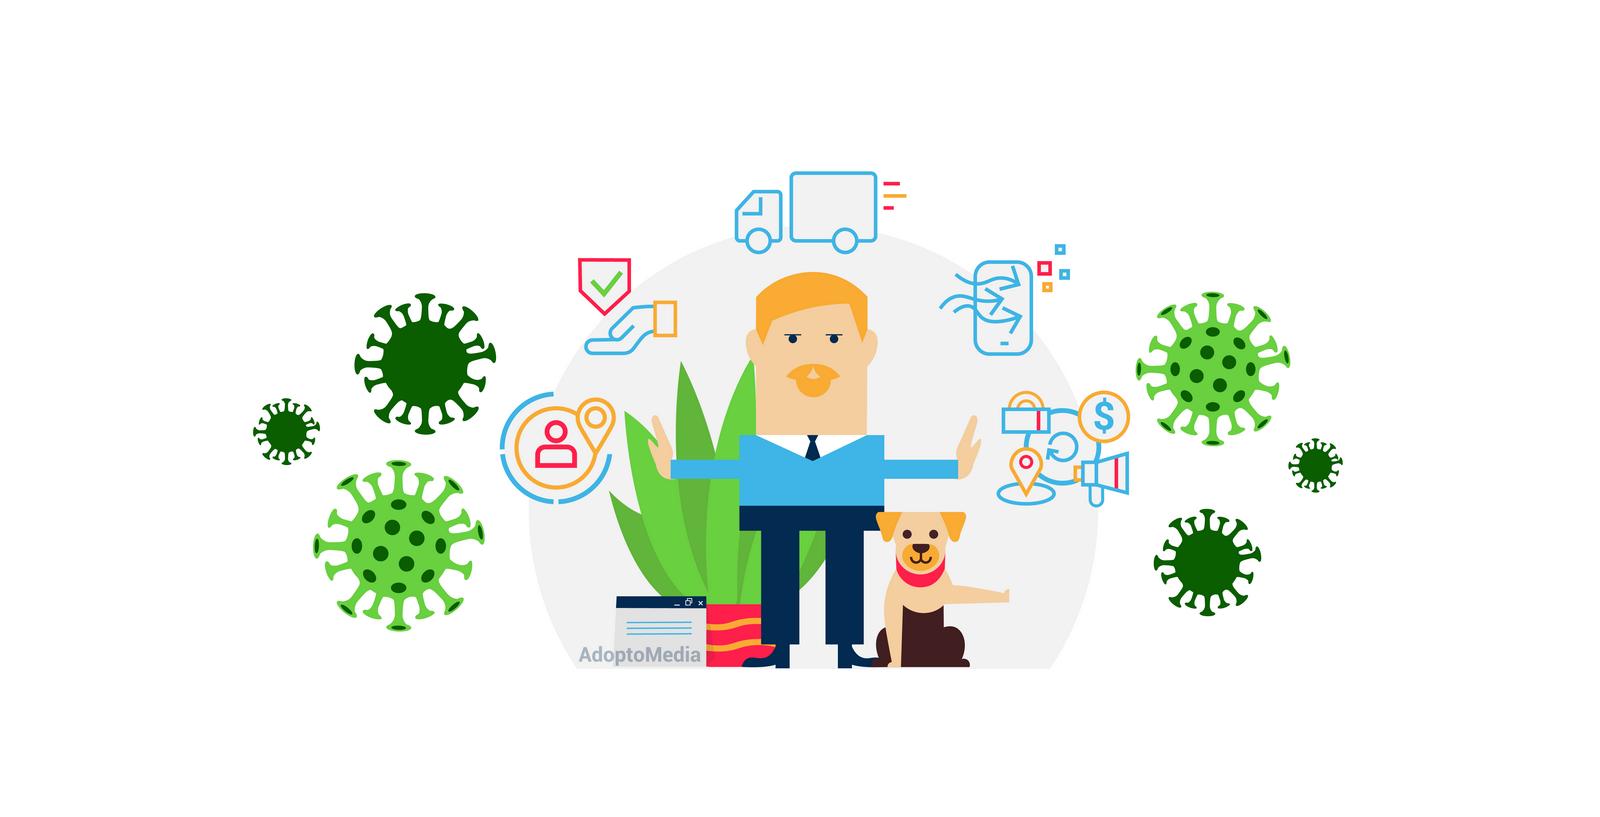 Effective marketing strategy, marketing effectiveness, coronavirus pandemic, COVID-19, marketing investments, ROMI increase, crisis marketing strategy, adapt marketing strategy, e-commerce, media budget reallocation, media budget optimization